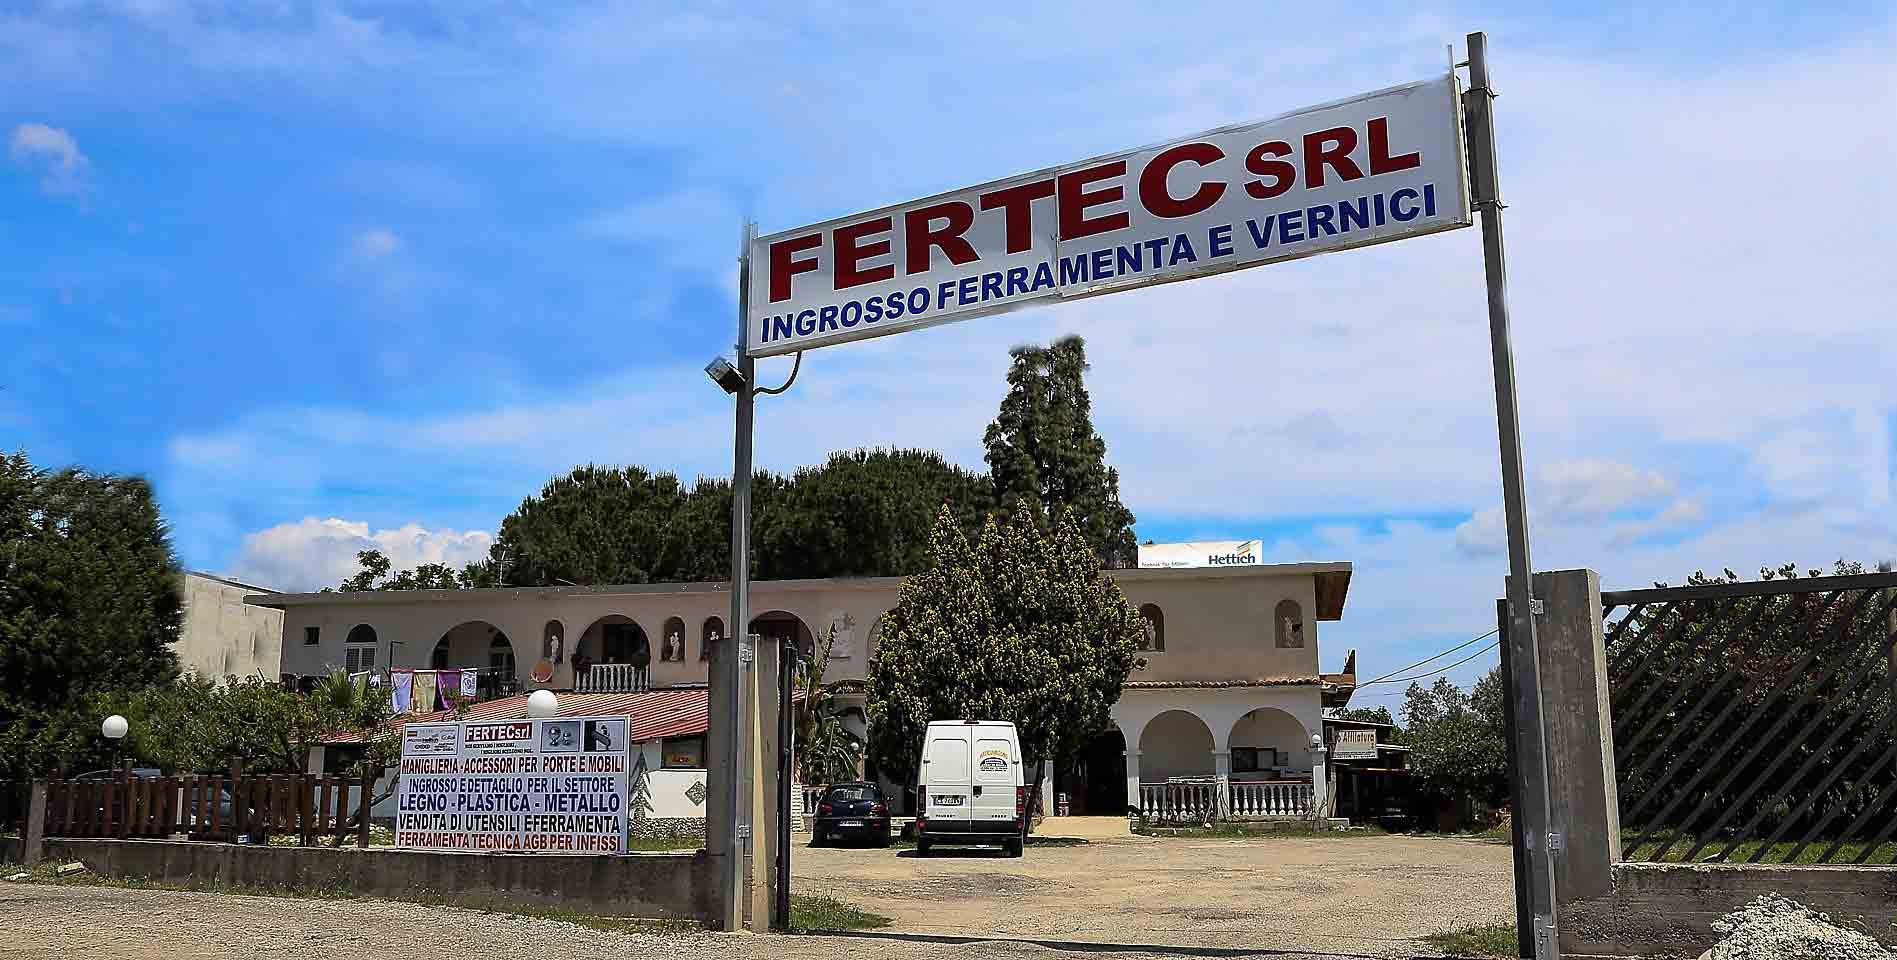 Ingresso Fertec Srl